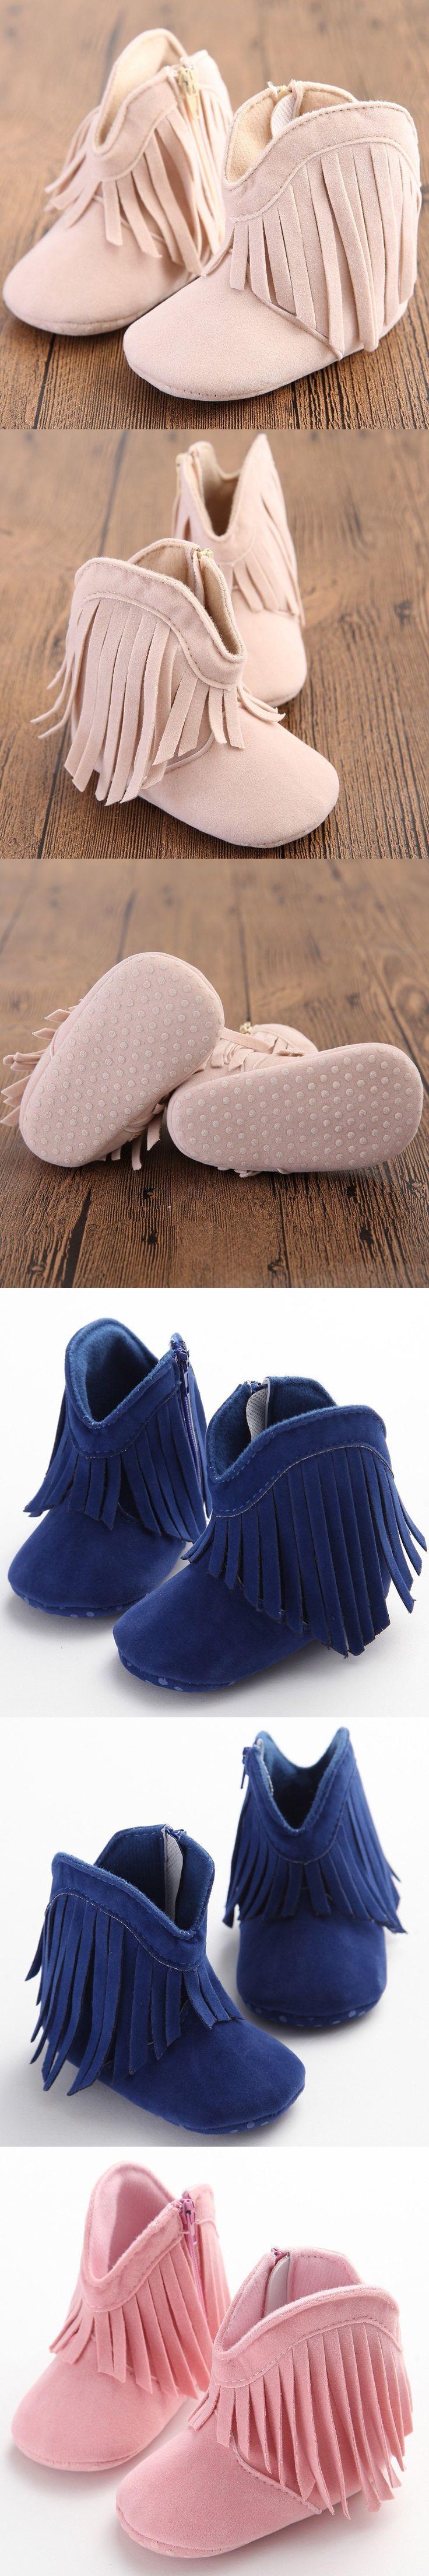 Moccasin Moccs Newborn Baby Girl Boy Kids Prewalker Solid Fringe Shoes Infant Toddler Soft Soled Anti-slip Boots Booties 0-1Yea